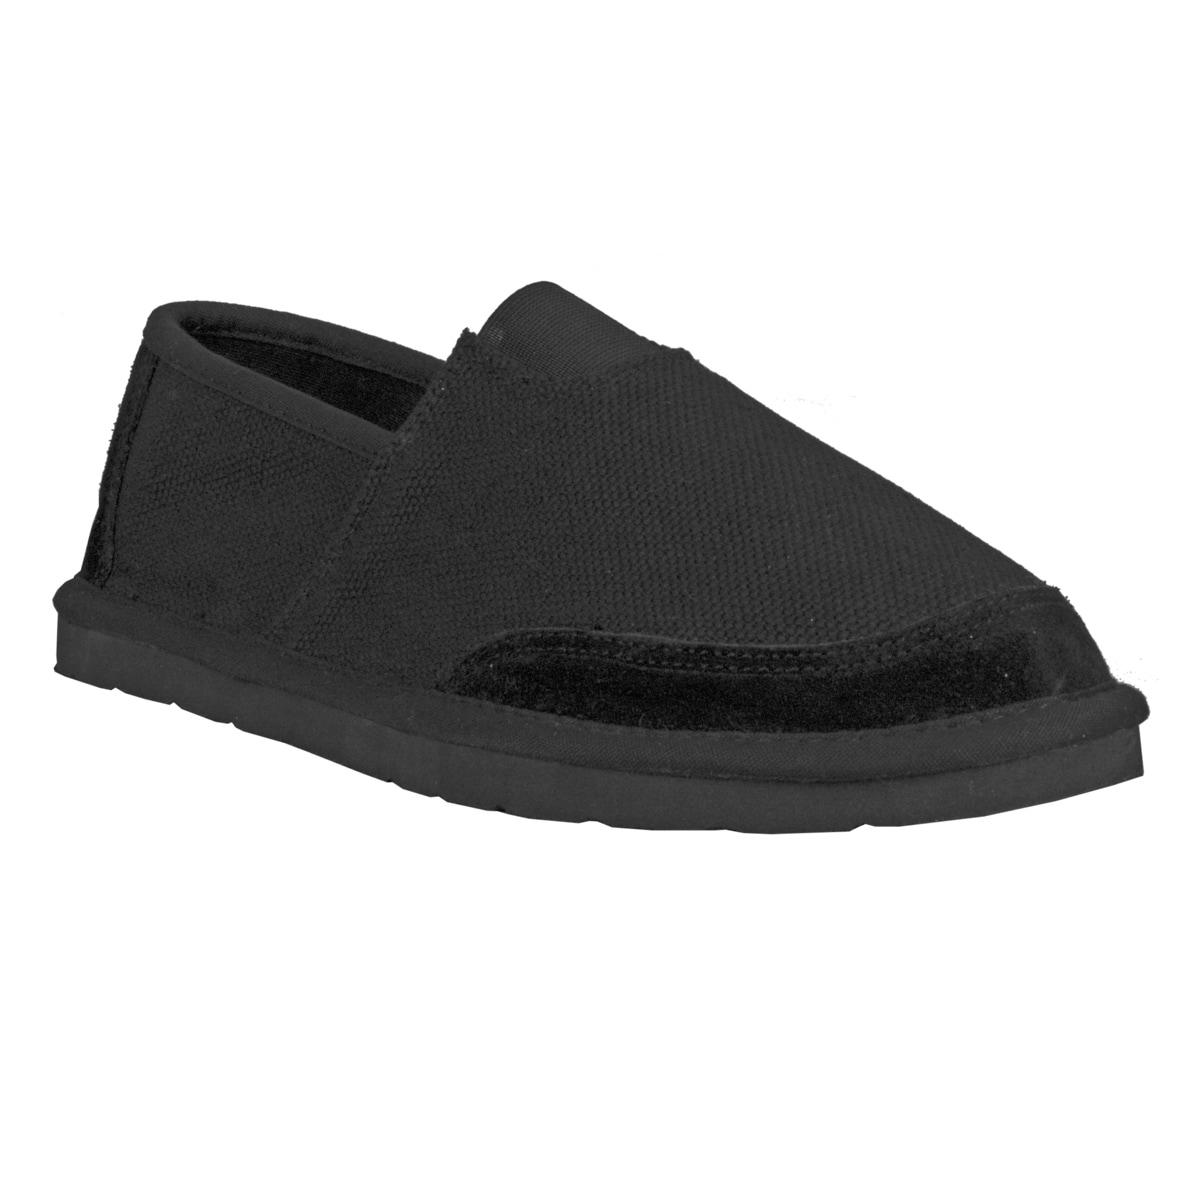 Lugz Men's 'Root' Canvas Suede Black Slip-on Shoes